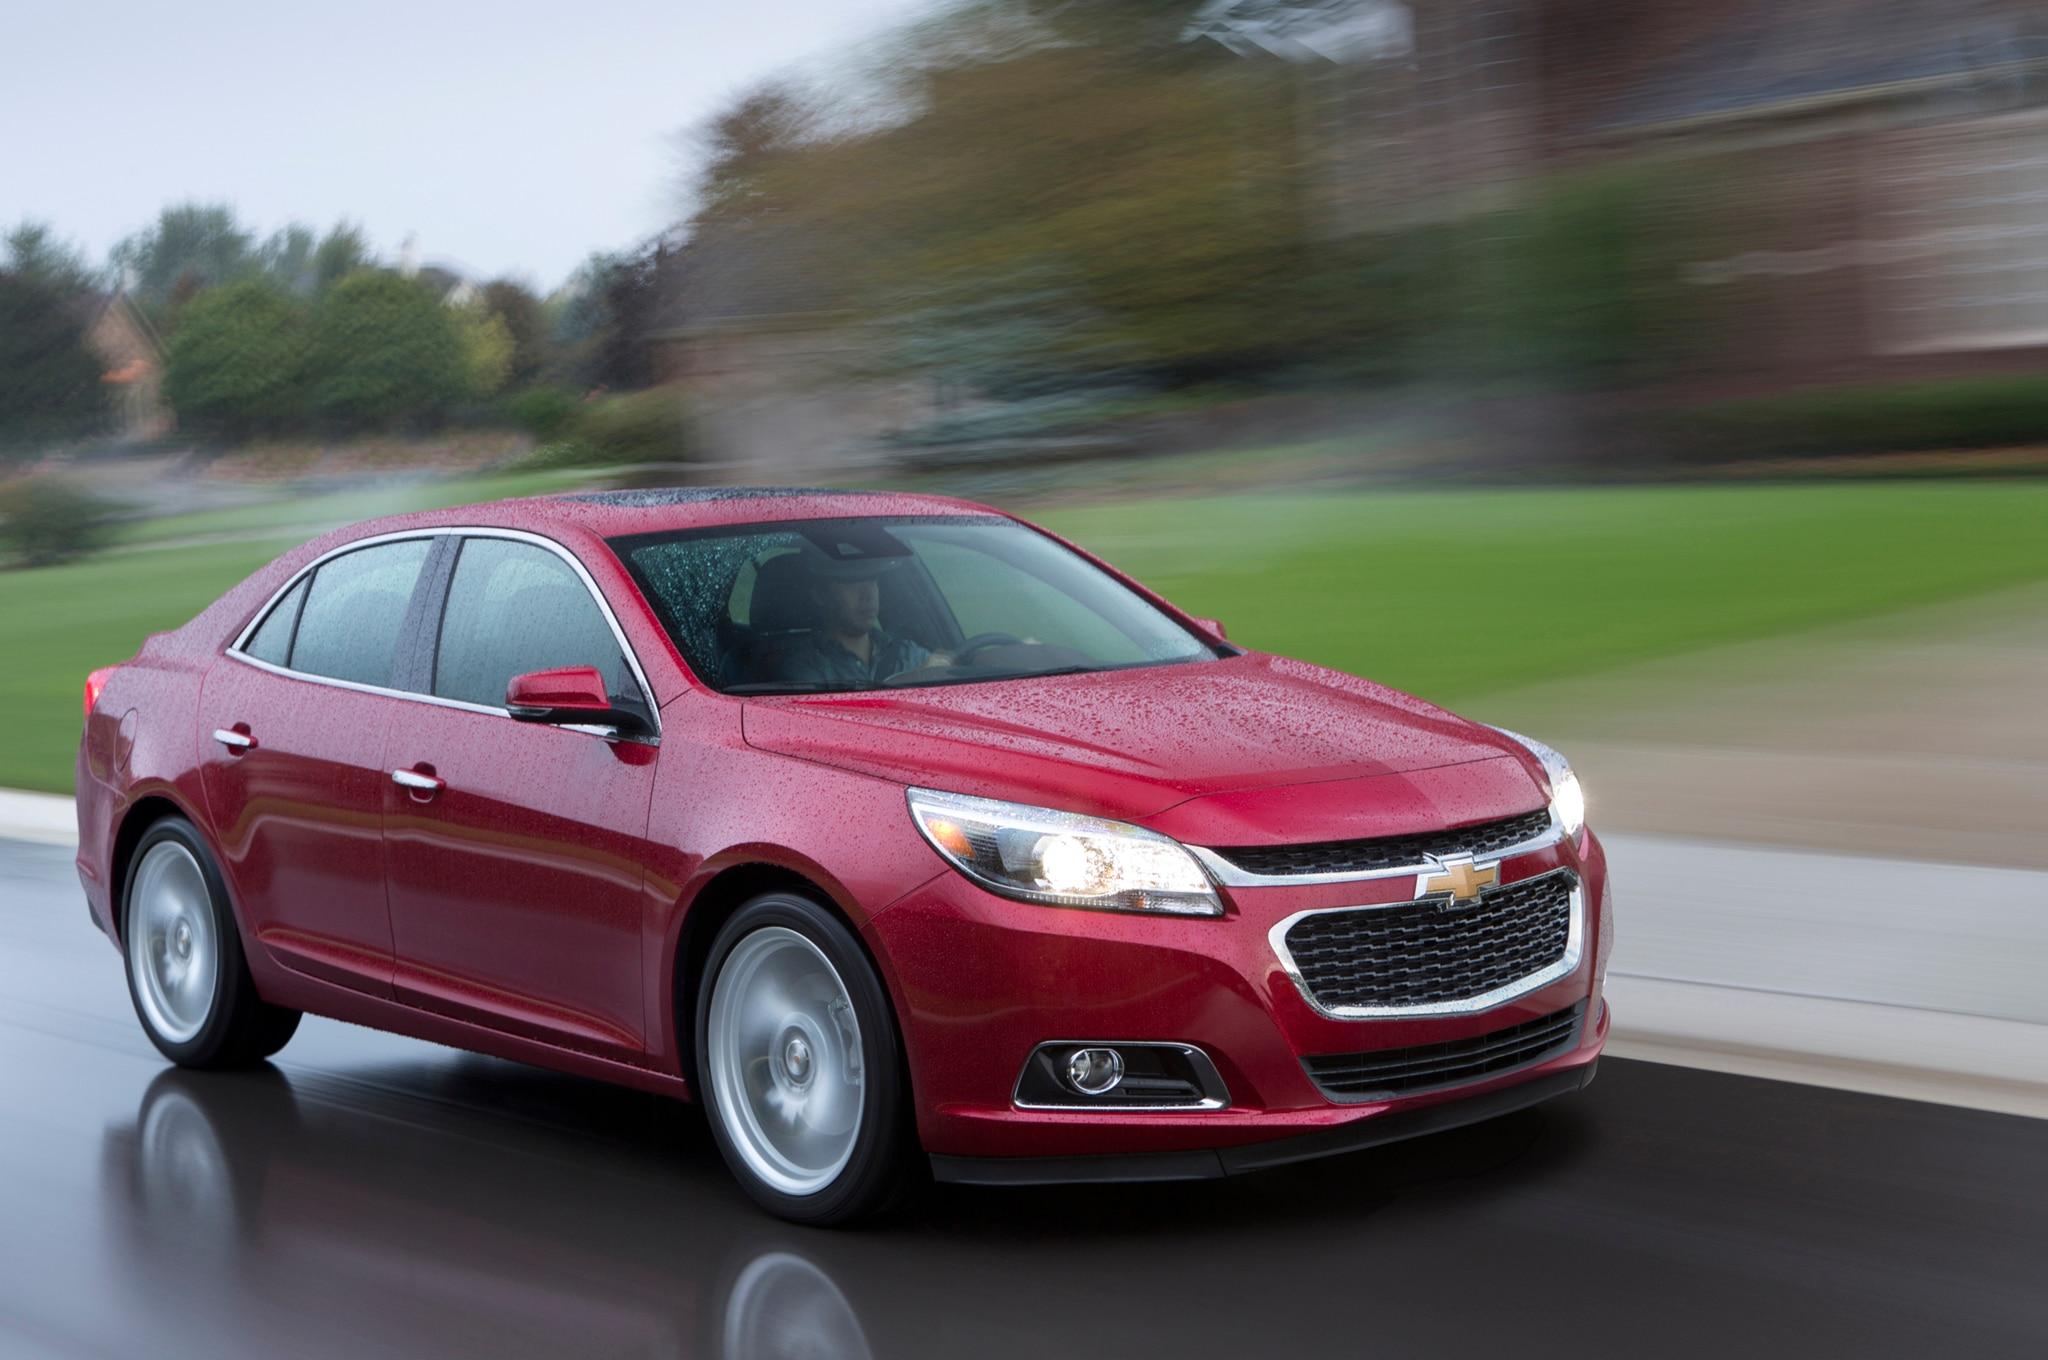 2014 Chevrolet Malibu First Drive - Automobile Magazine